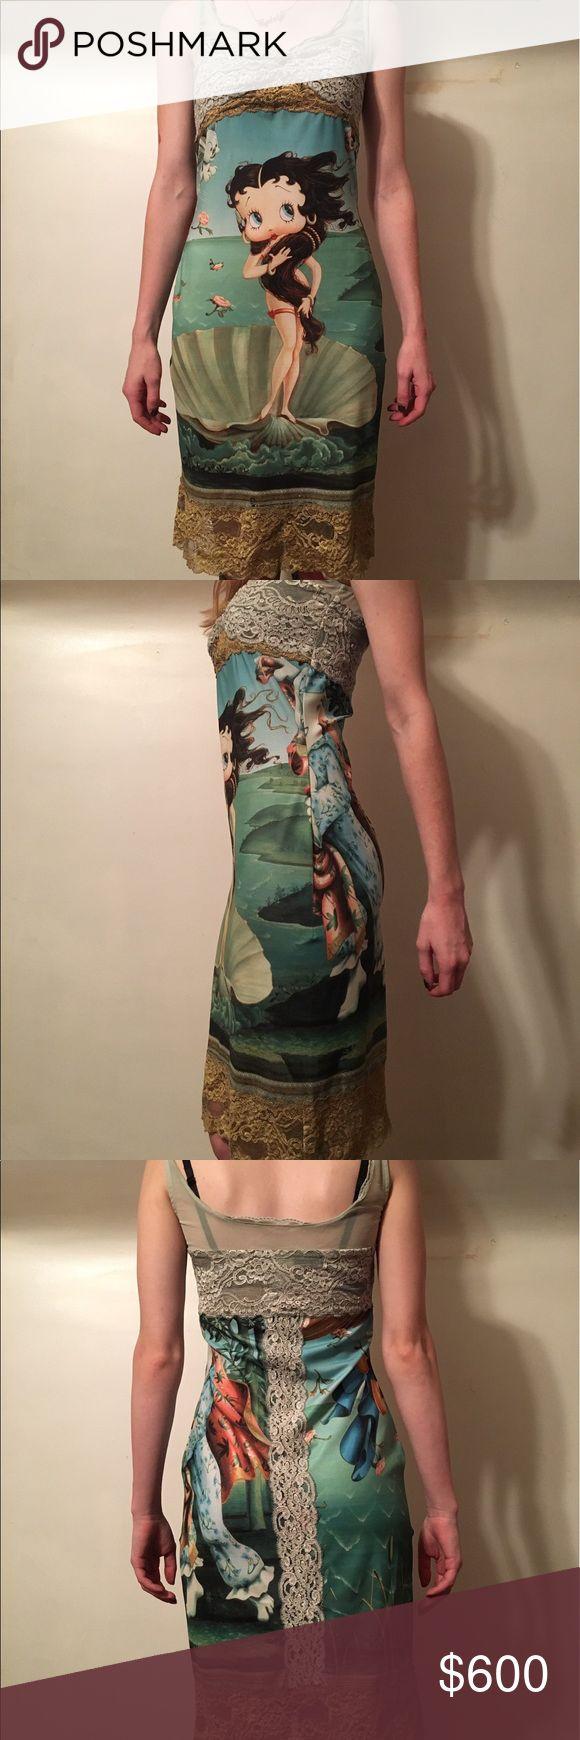 Eletra Casadei Betty Boop Birth of Venus Dress Extremely Rare! Eletra Casadei Betty Boop Birth of Venus Dress  (like new)  Size: Small/Medium  Color: Multi Casadei Dresses Midi